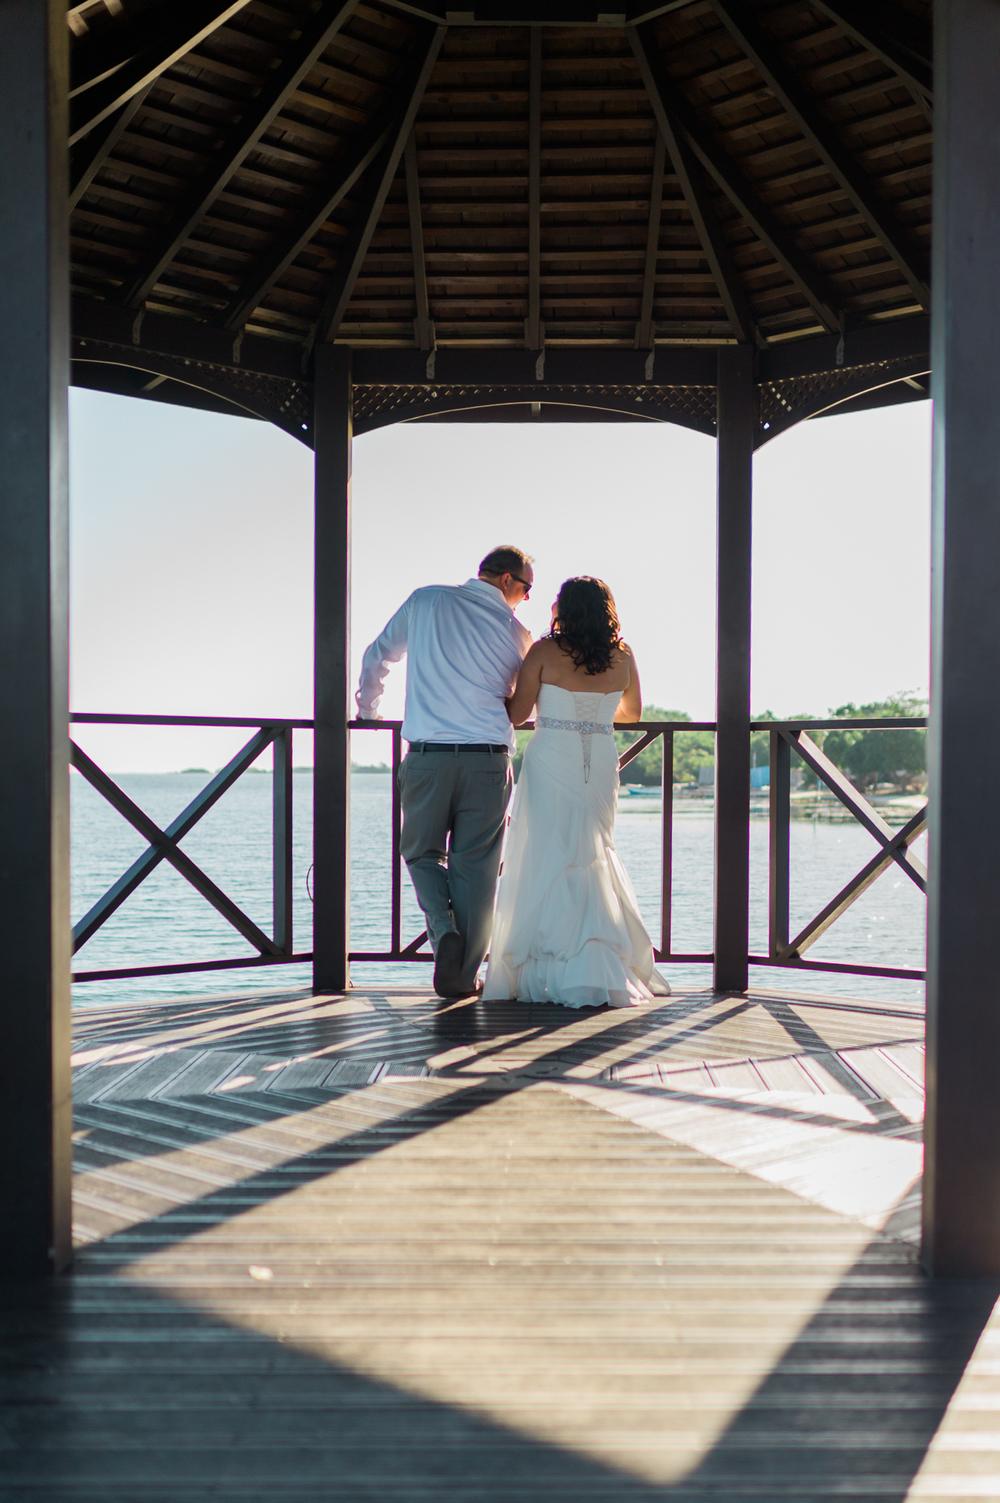 JadeandRyan-Montego-Bay-Jamaica-Wedding-Iberostar-Resort-Beach-83.jpg